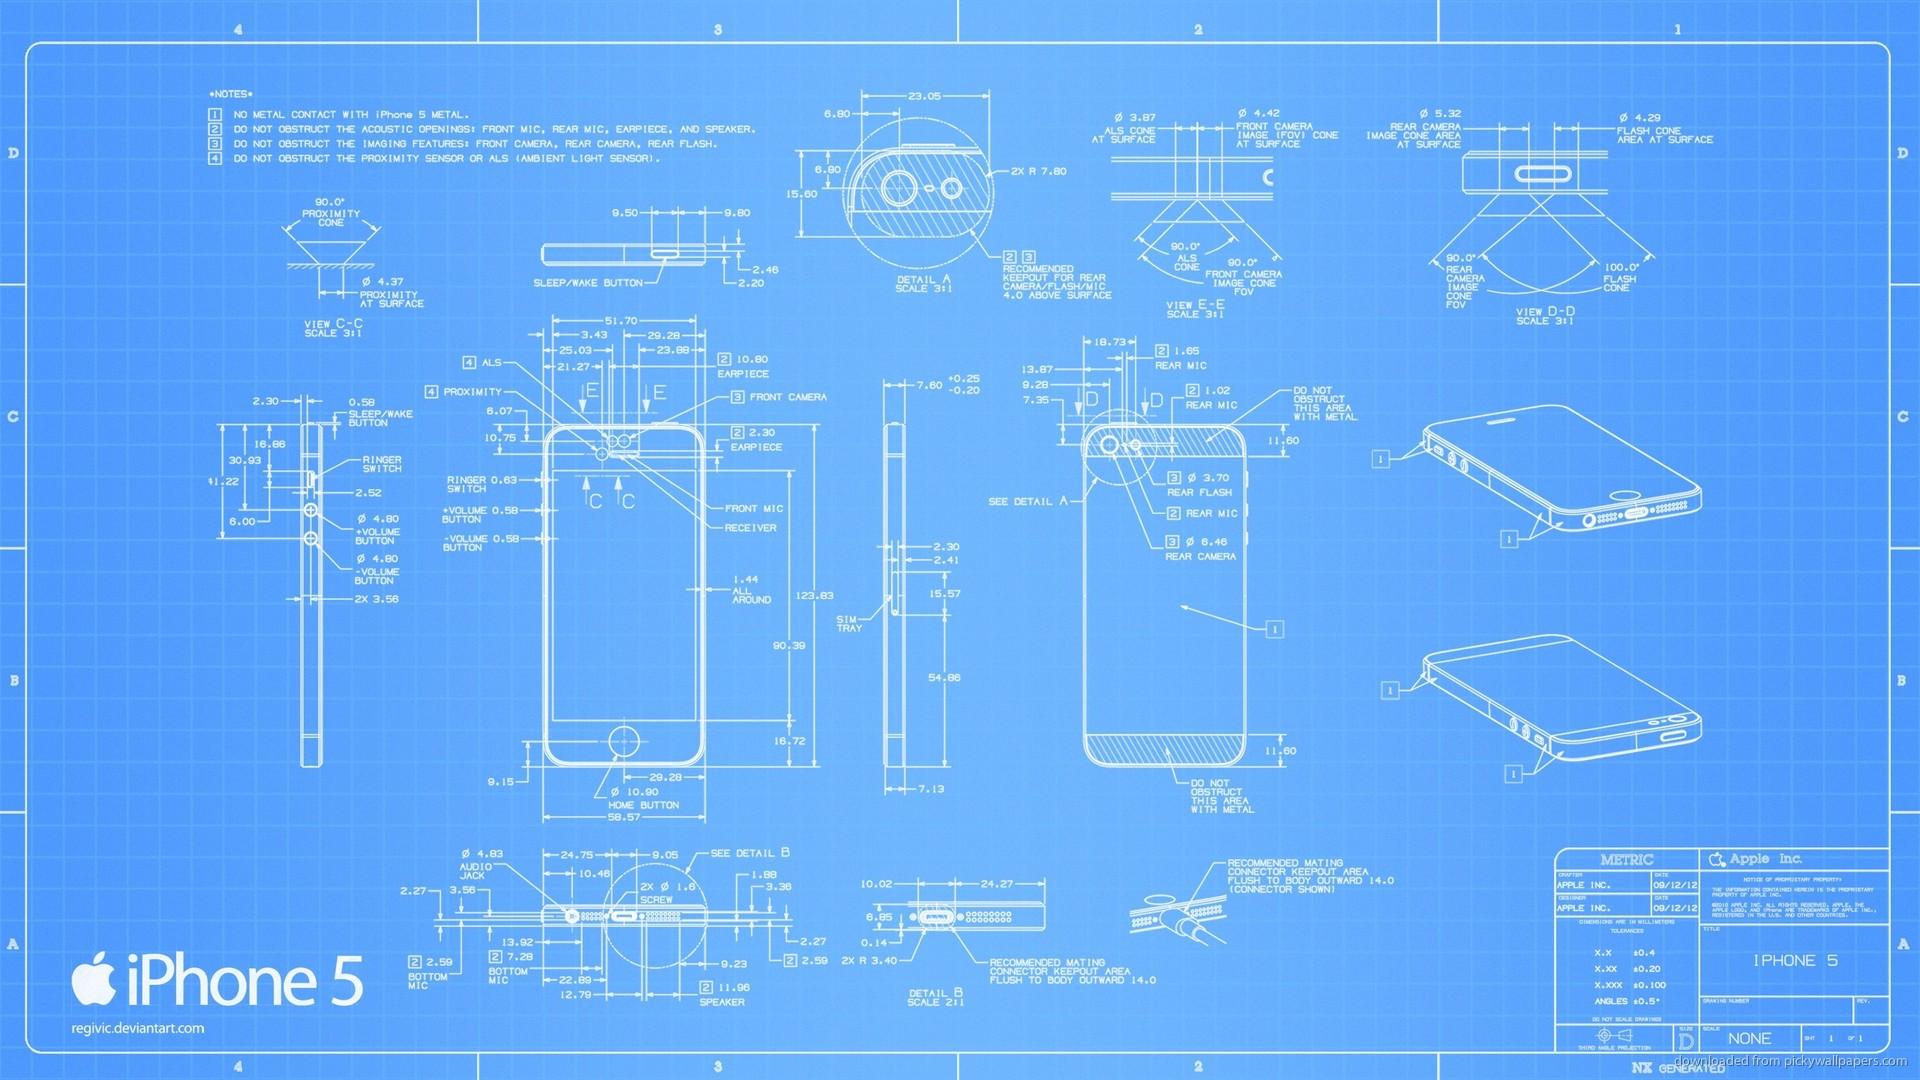 1920x1080px iphone 6 blueprint wallpaper wallpapersafari iphone 5 blueprint picture for iphone blackberry ipad apple iphone 1920x1080 malvernweather Image collections